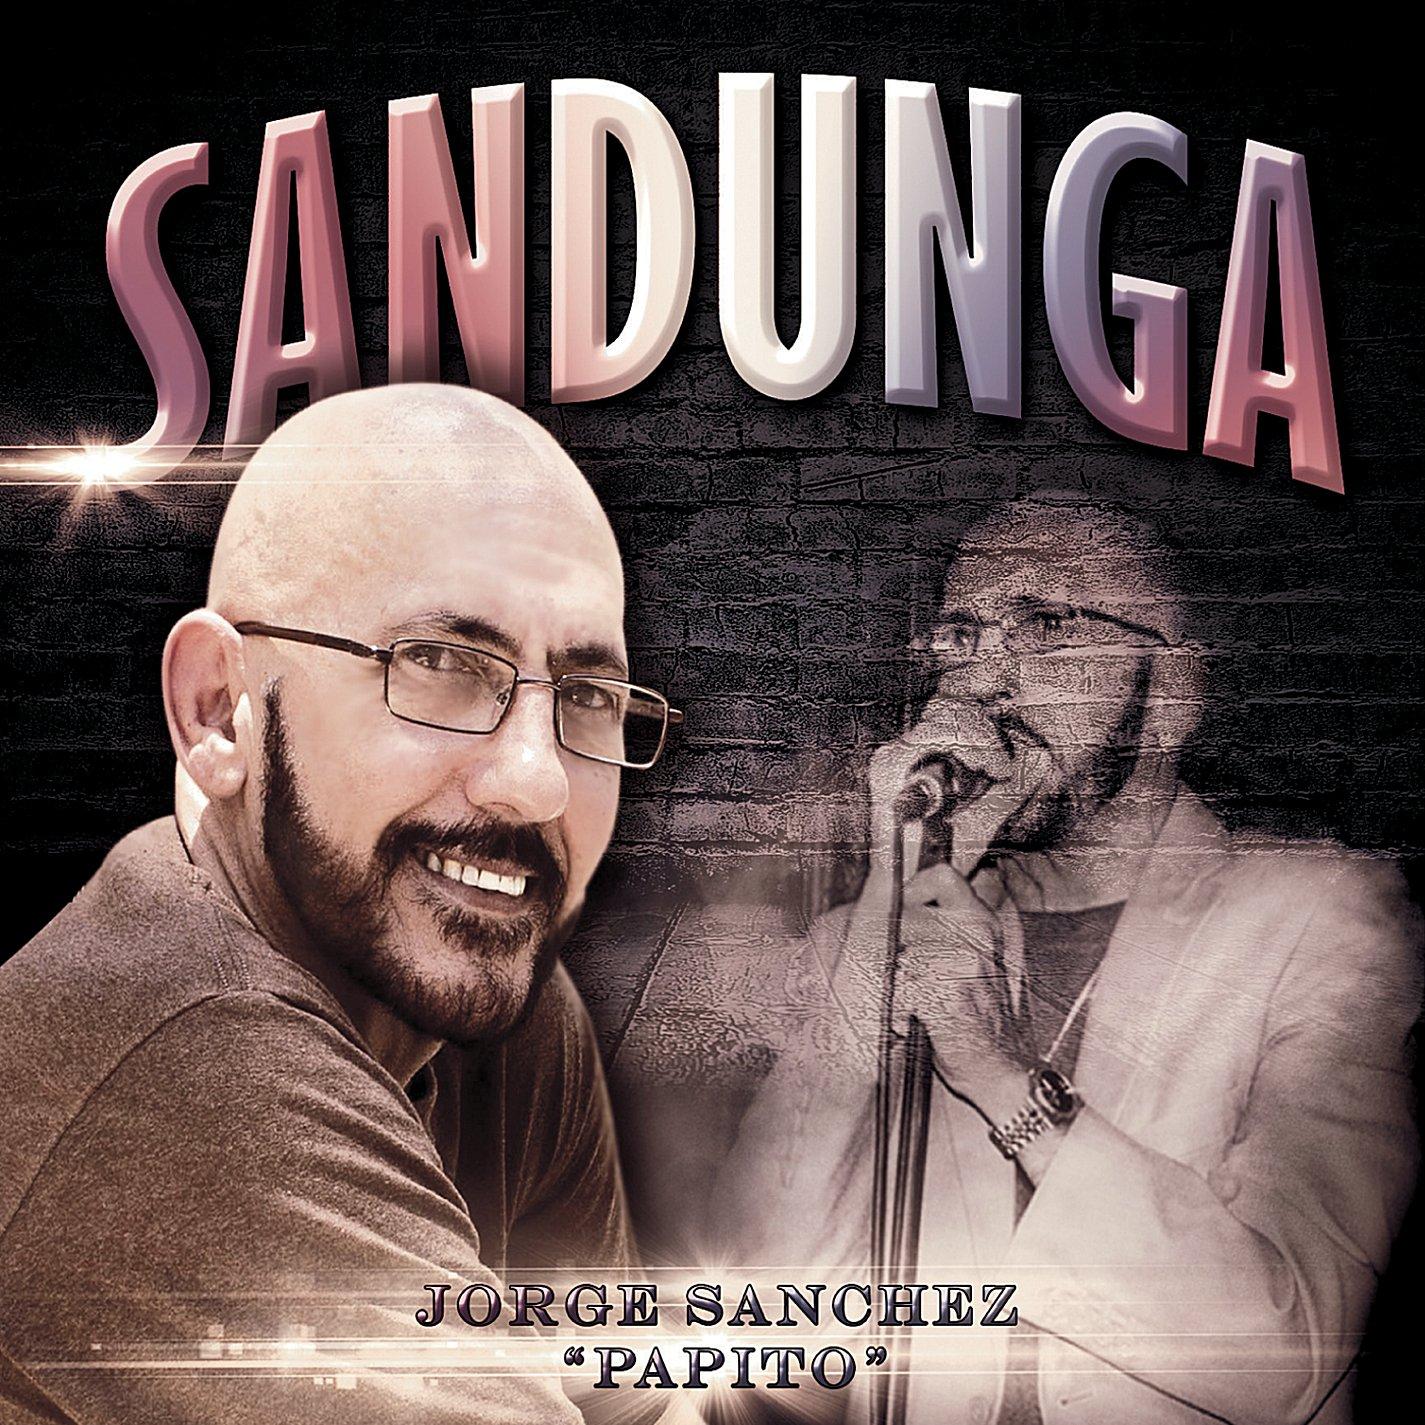 Sandunga San Diego Mall Free shipping